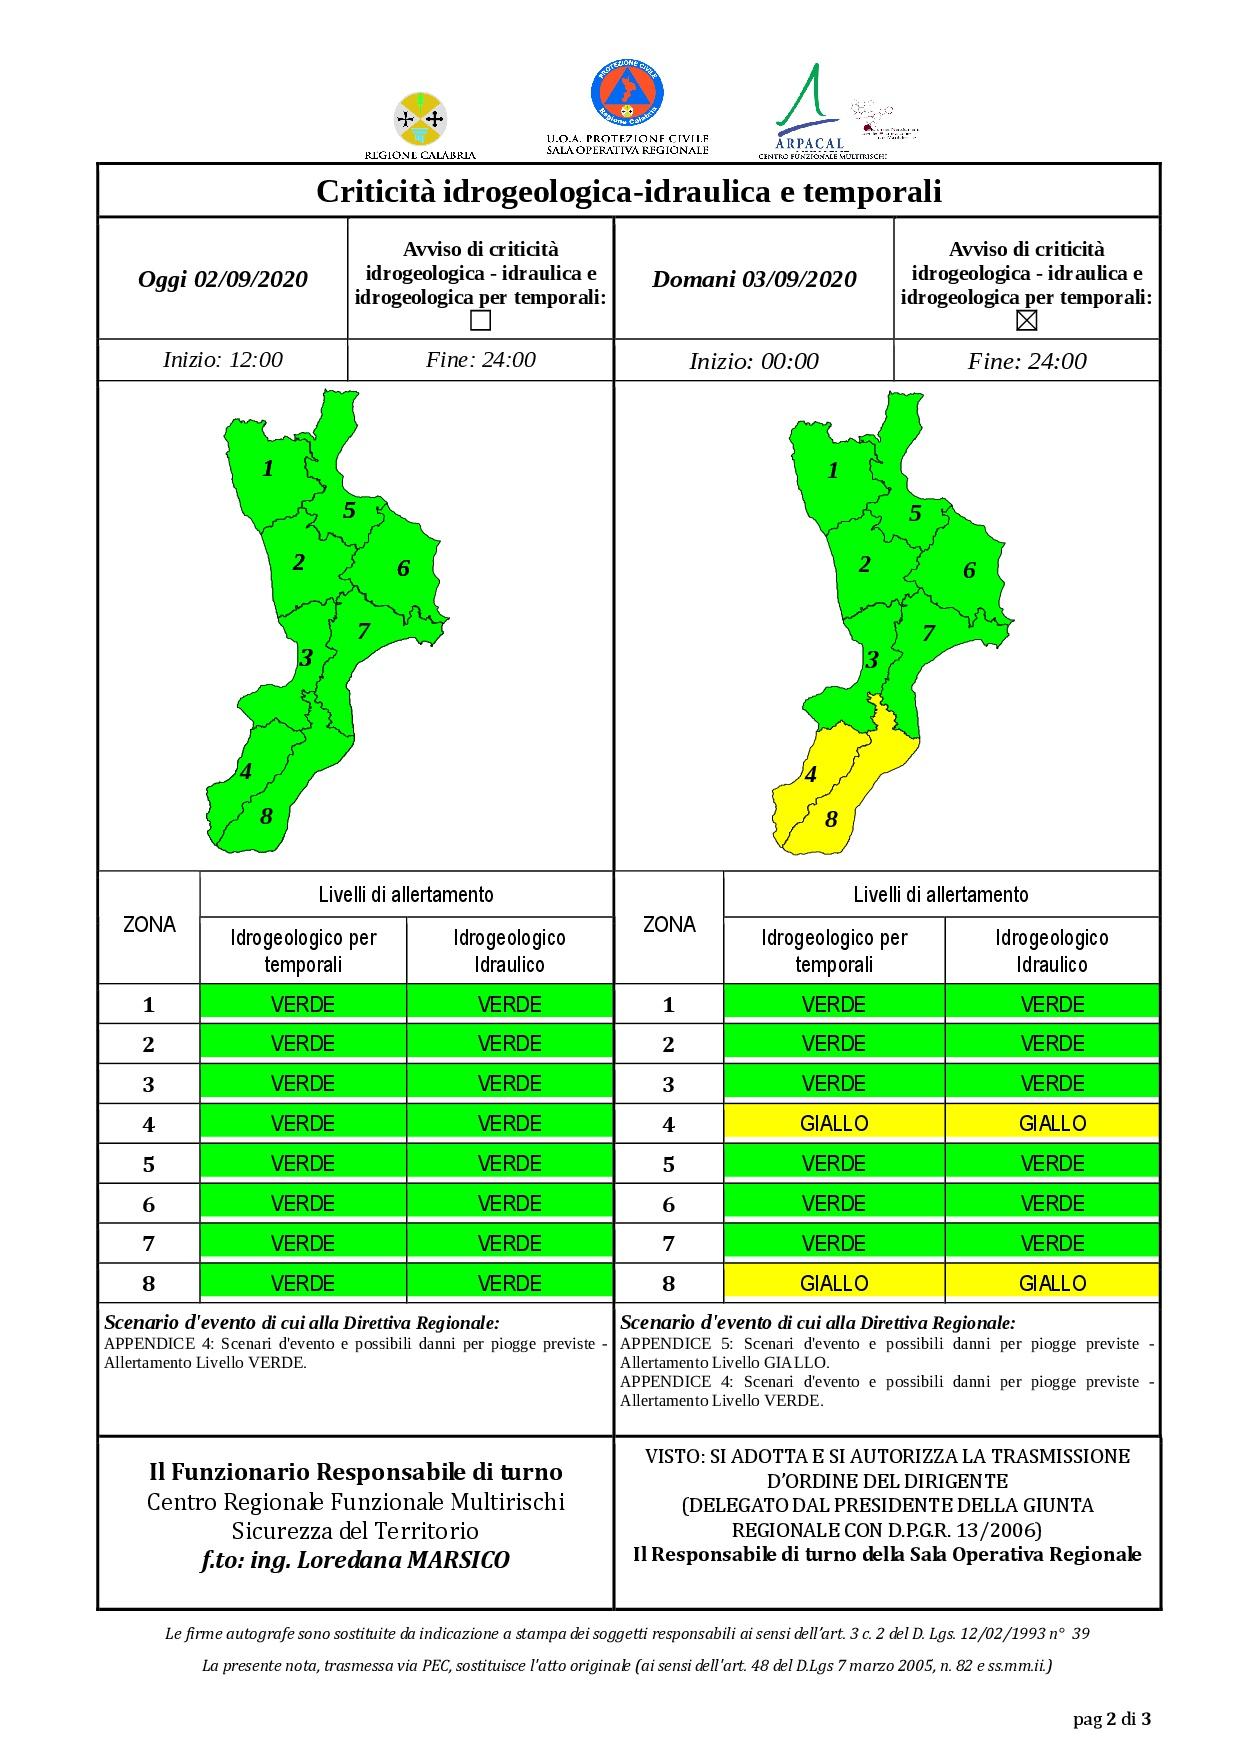 Criticità idrogeologica-idraulica e temporali in Calabria 02-09-2020